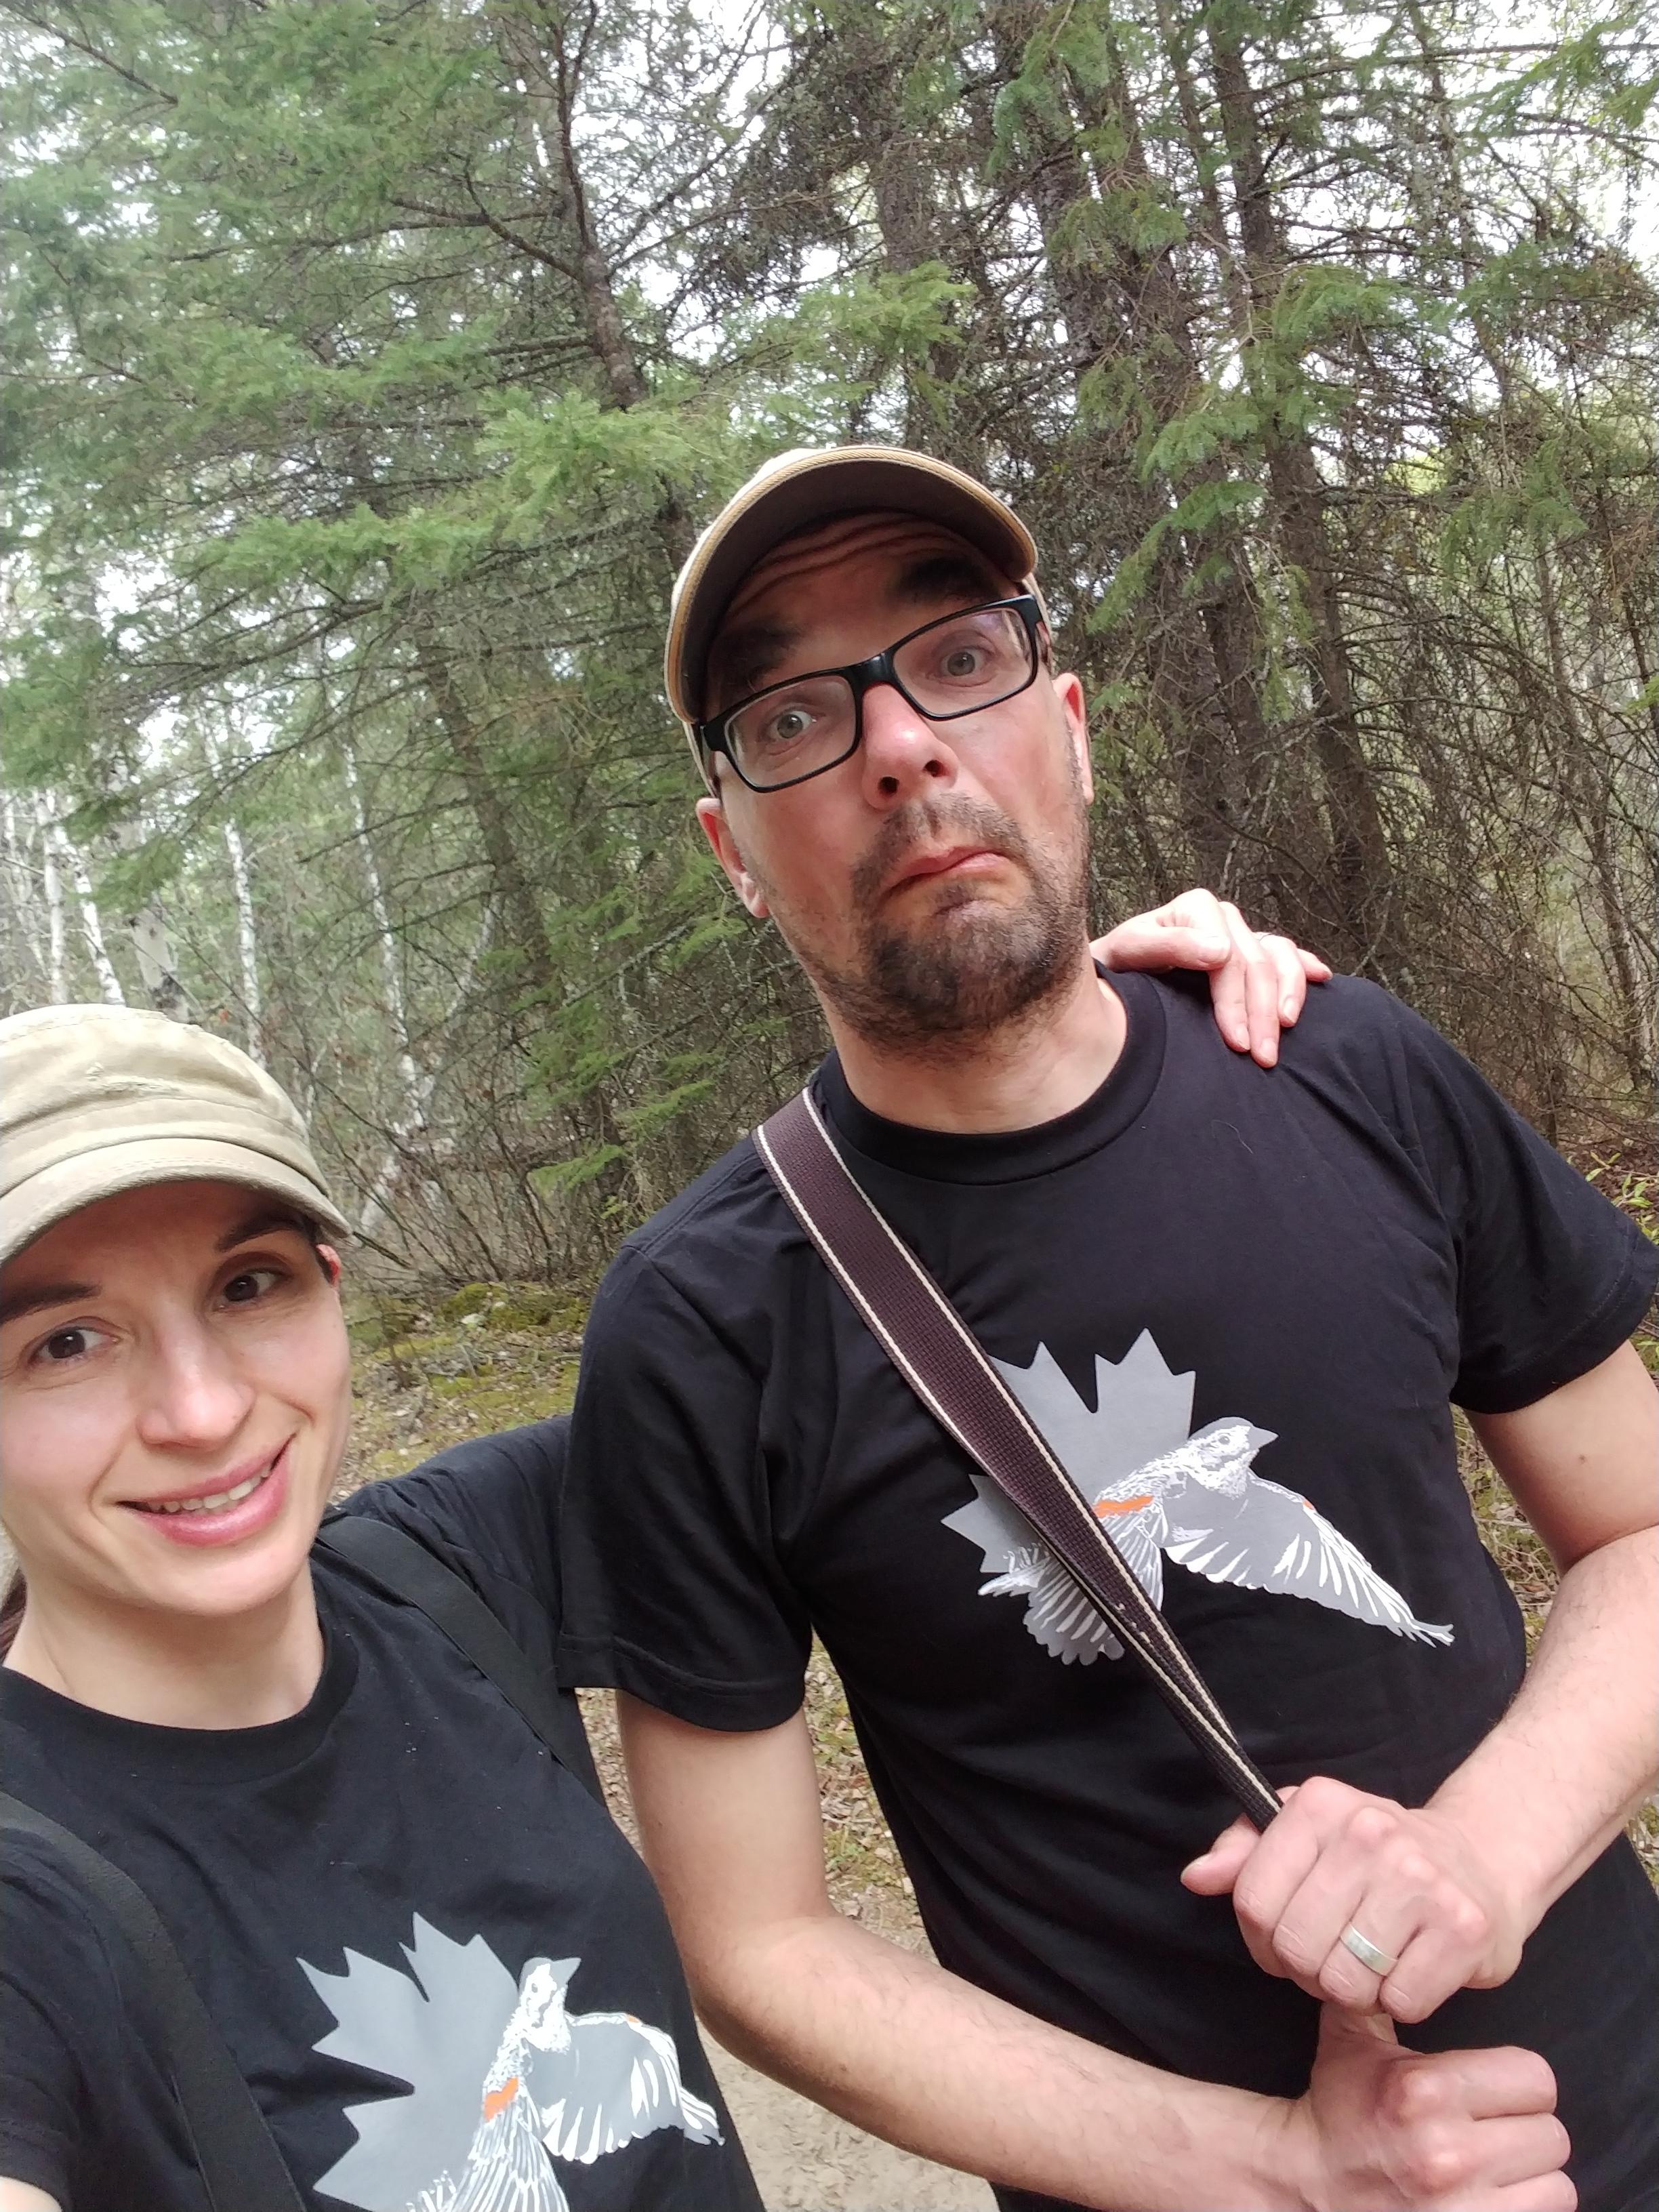 Team Birders in the Park photo